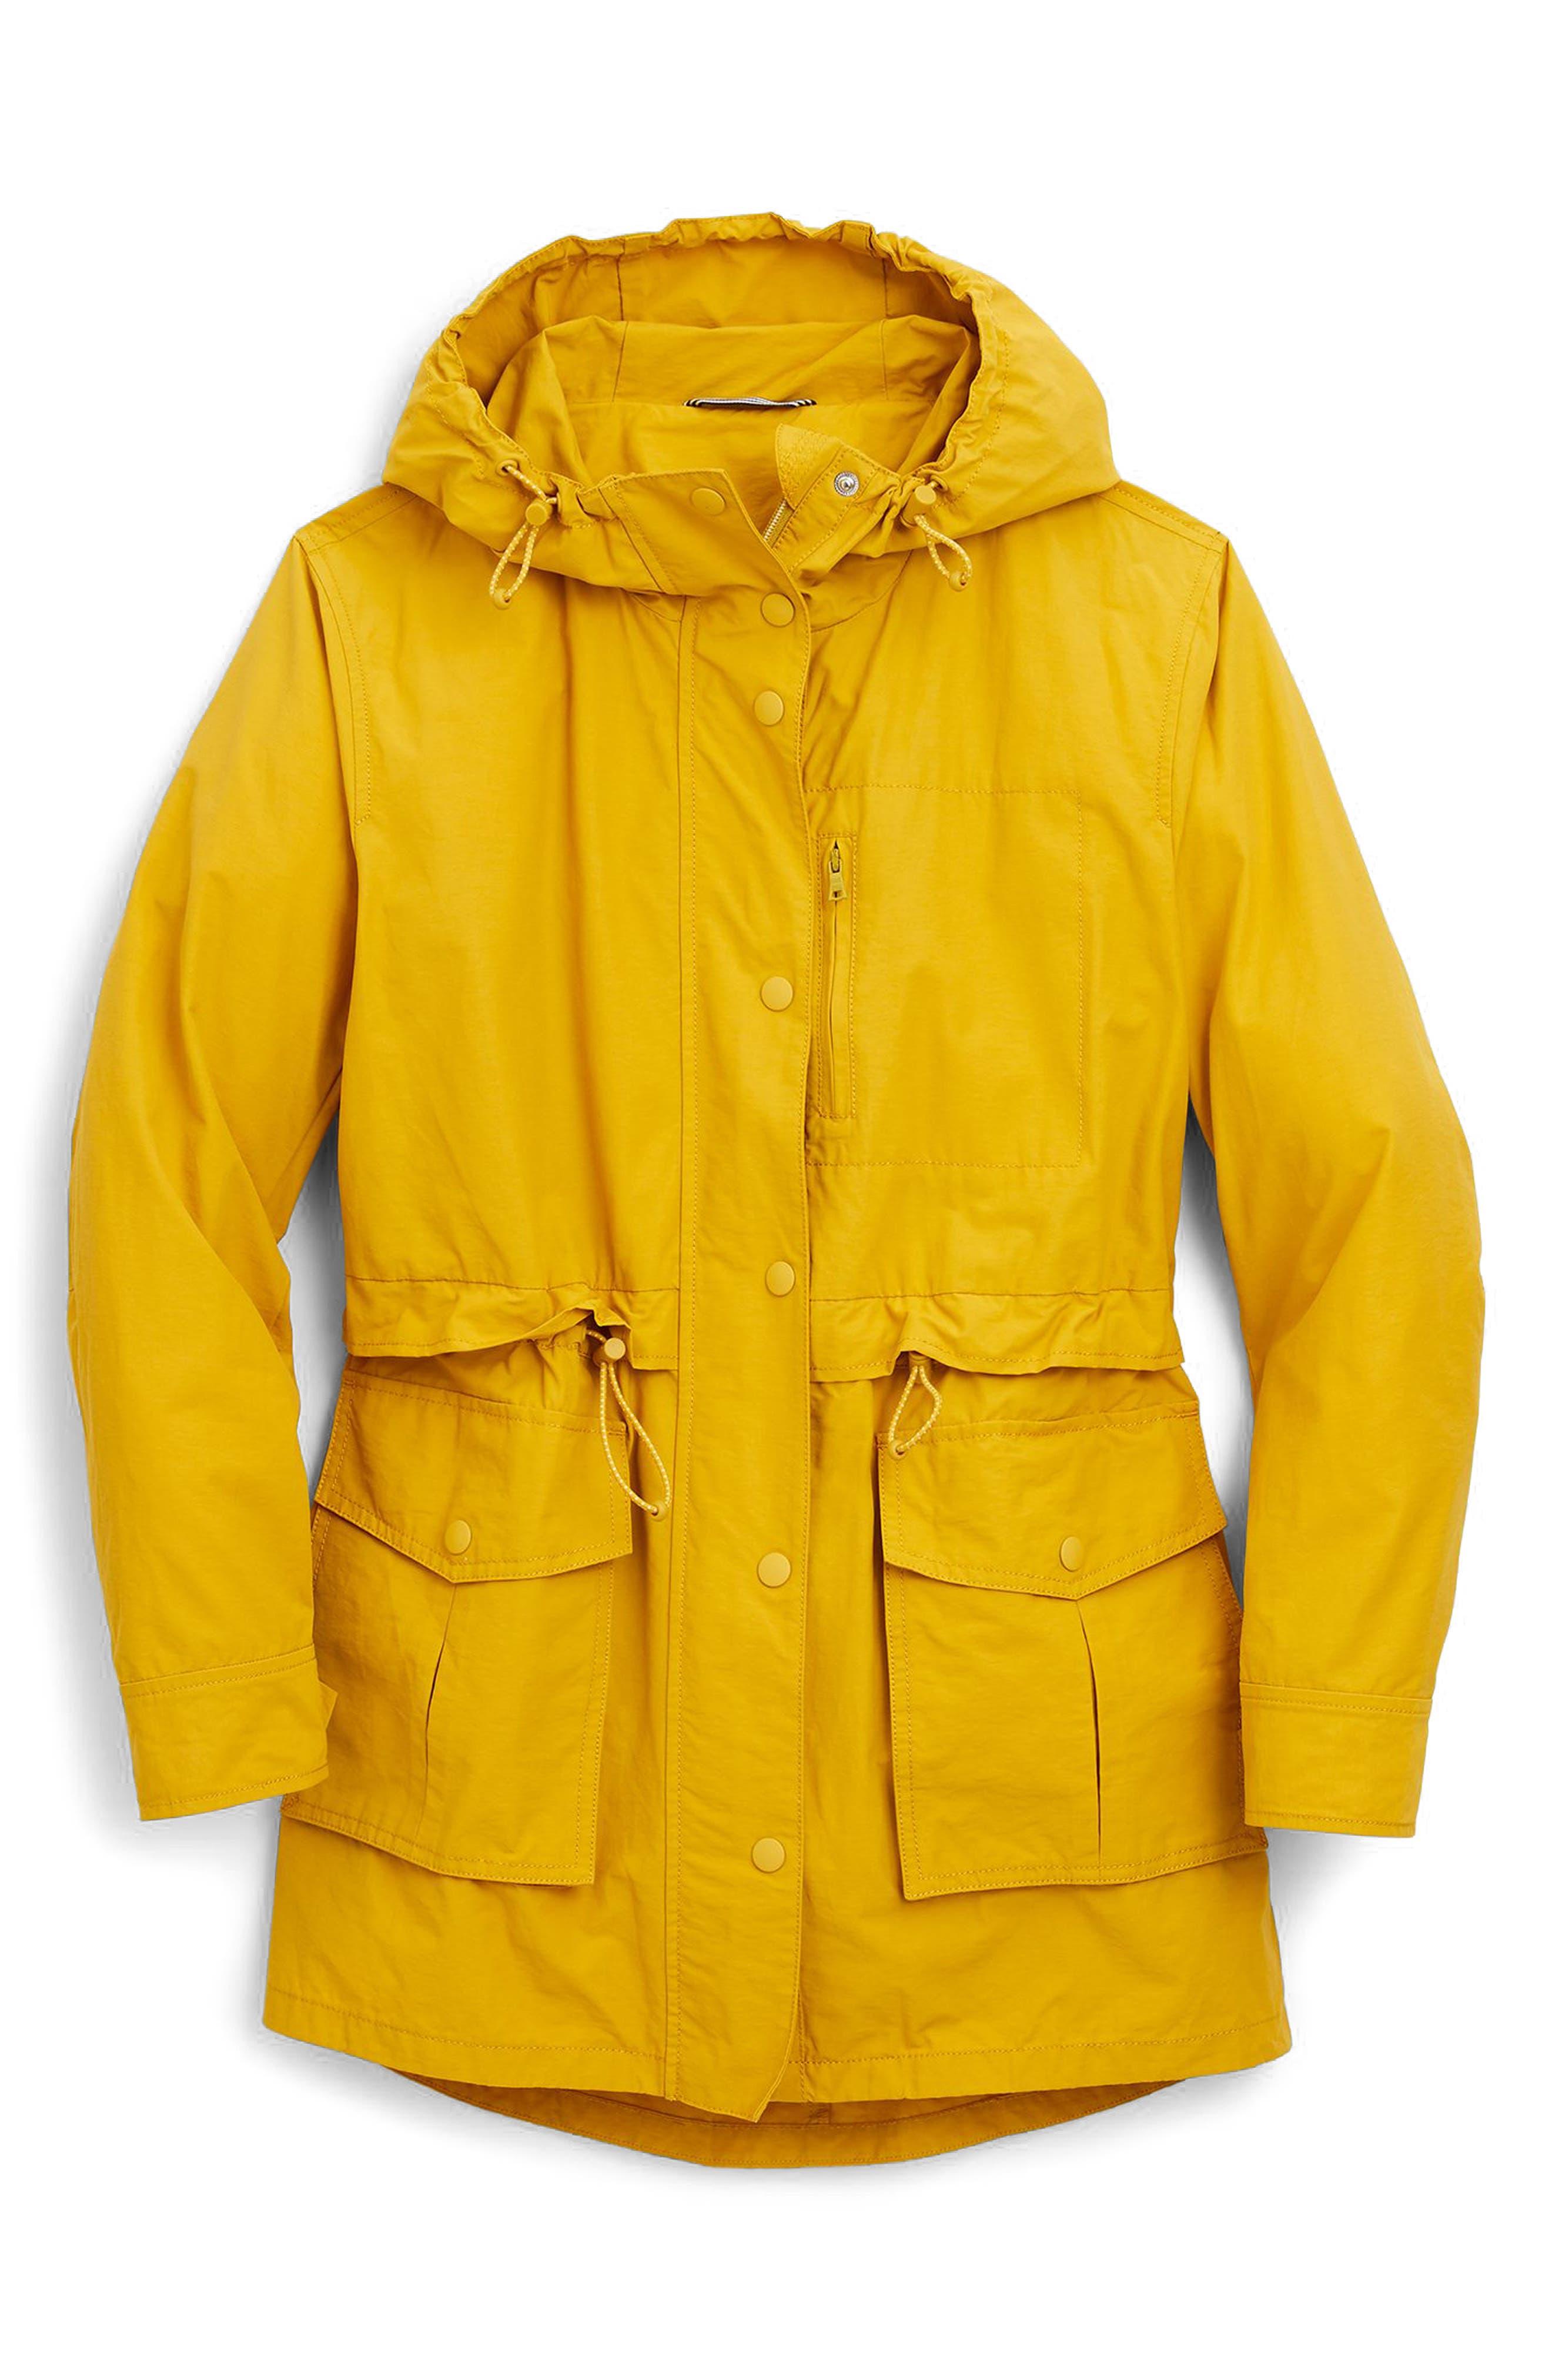 J.Crew Perfect Raincoat